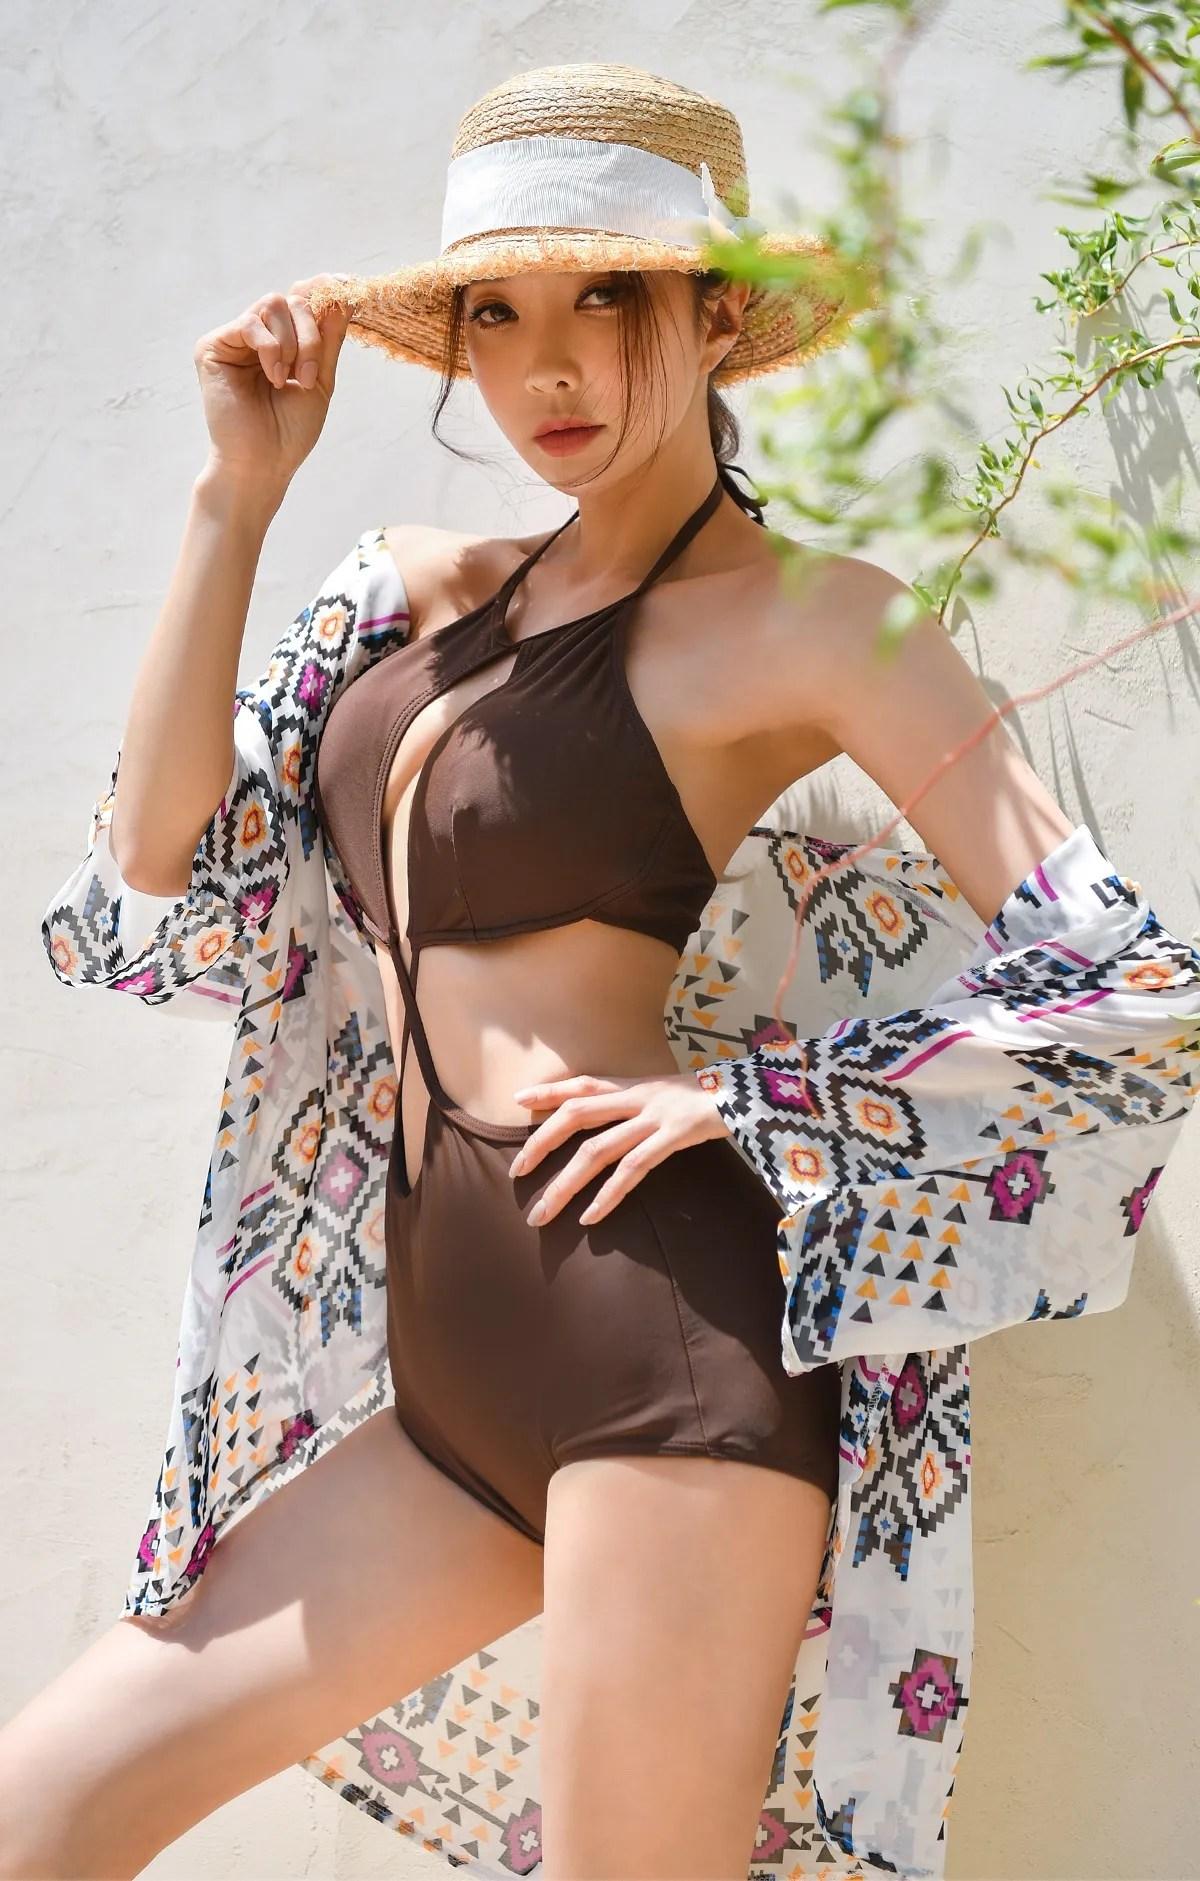 Park Suyeon / vendis / May 2021 / Sundress & Monokini Photoshoot Part 3